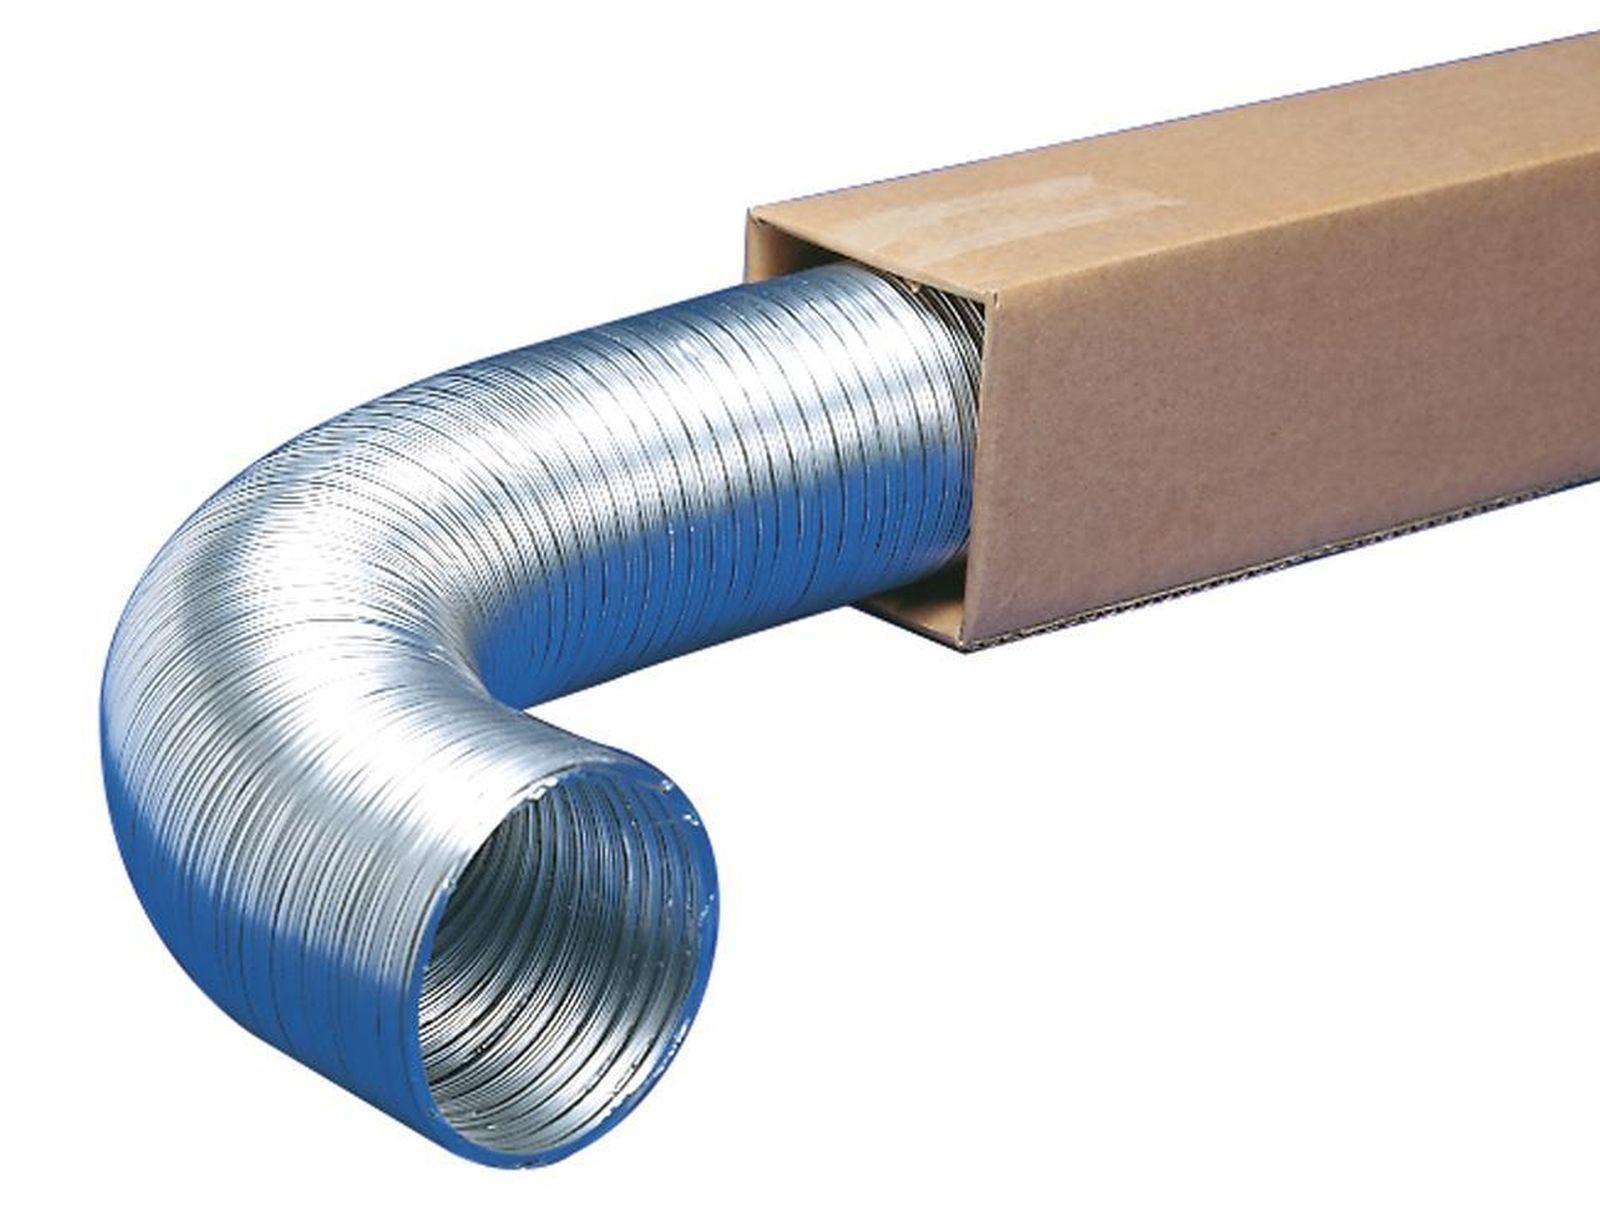 Abluft aluminium flexschlauch m trockner Ø mm abzugshaube